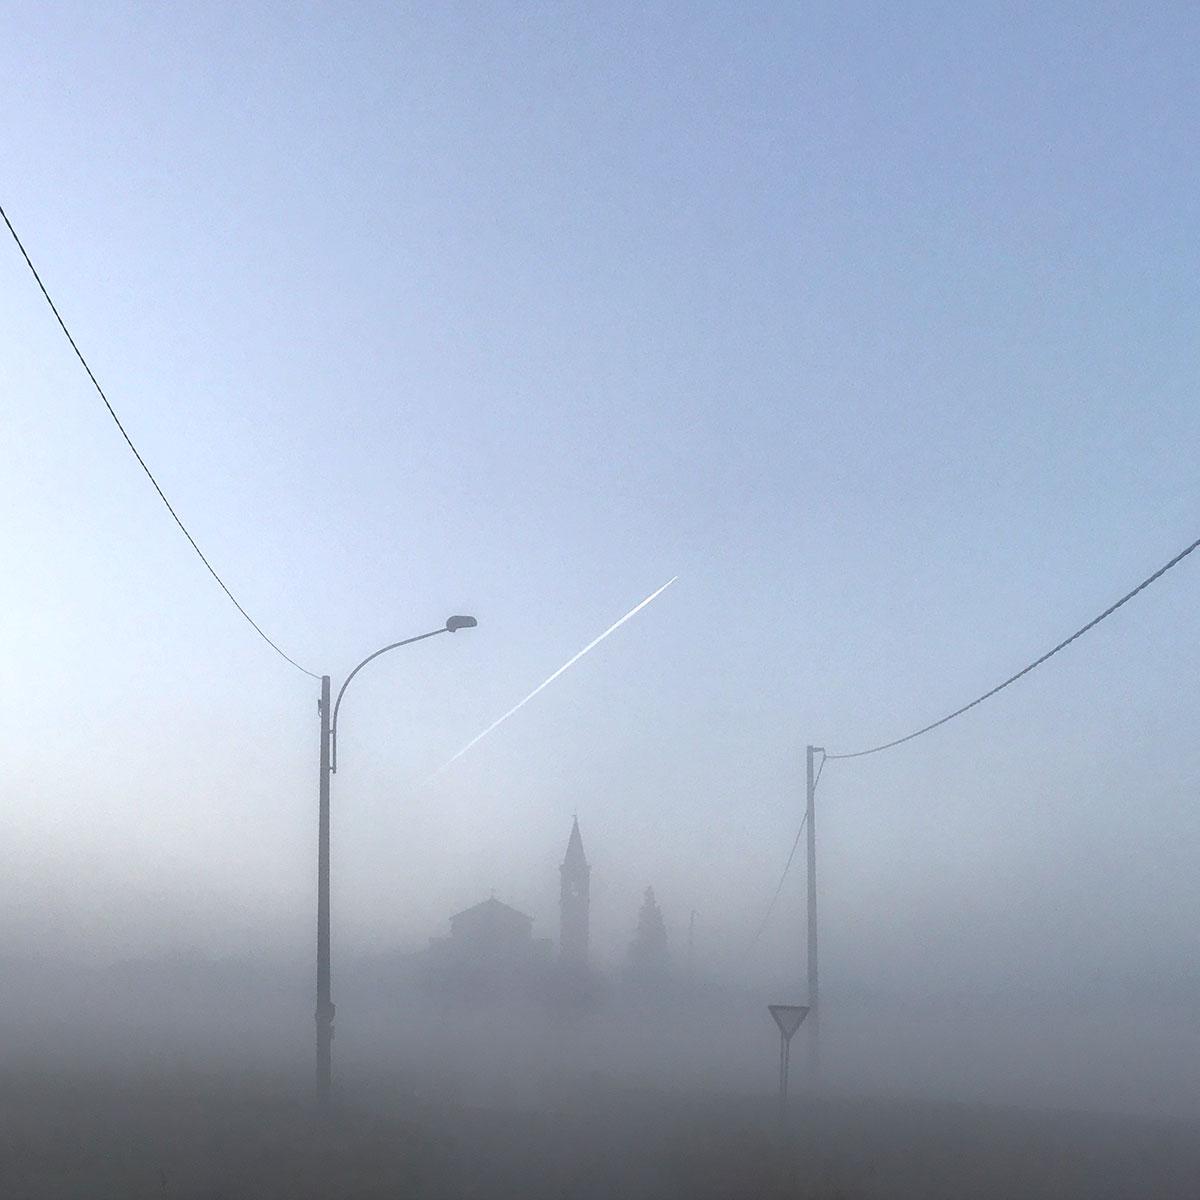 Over the fog...